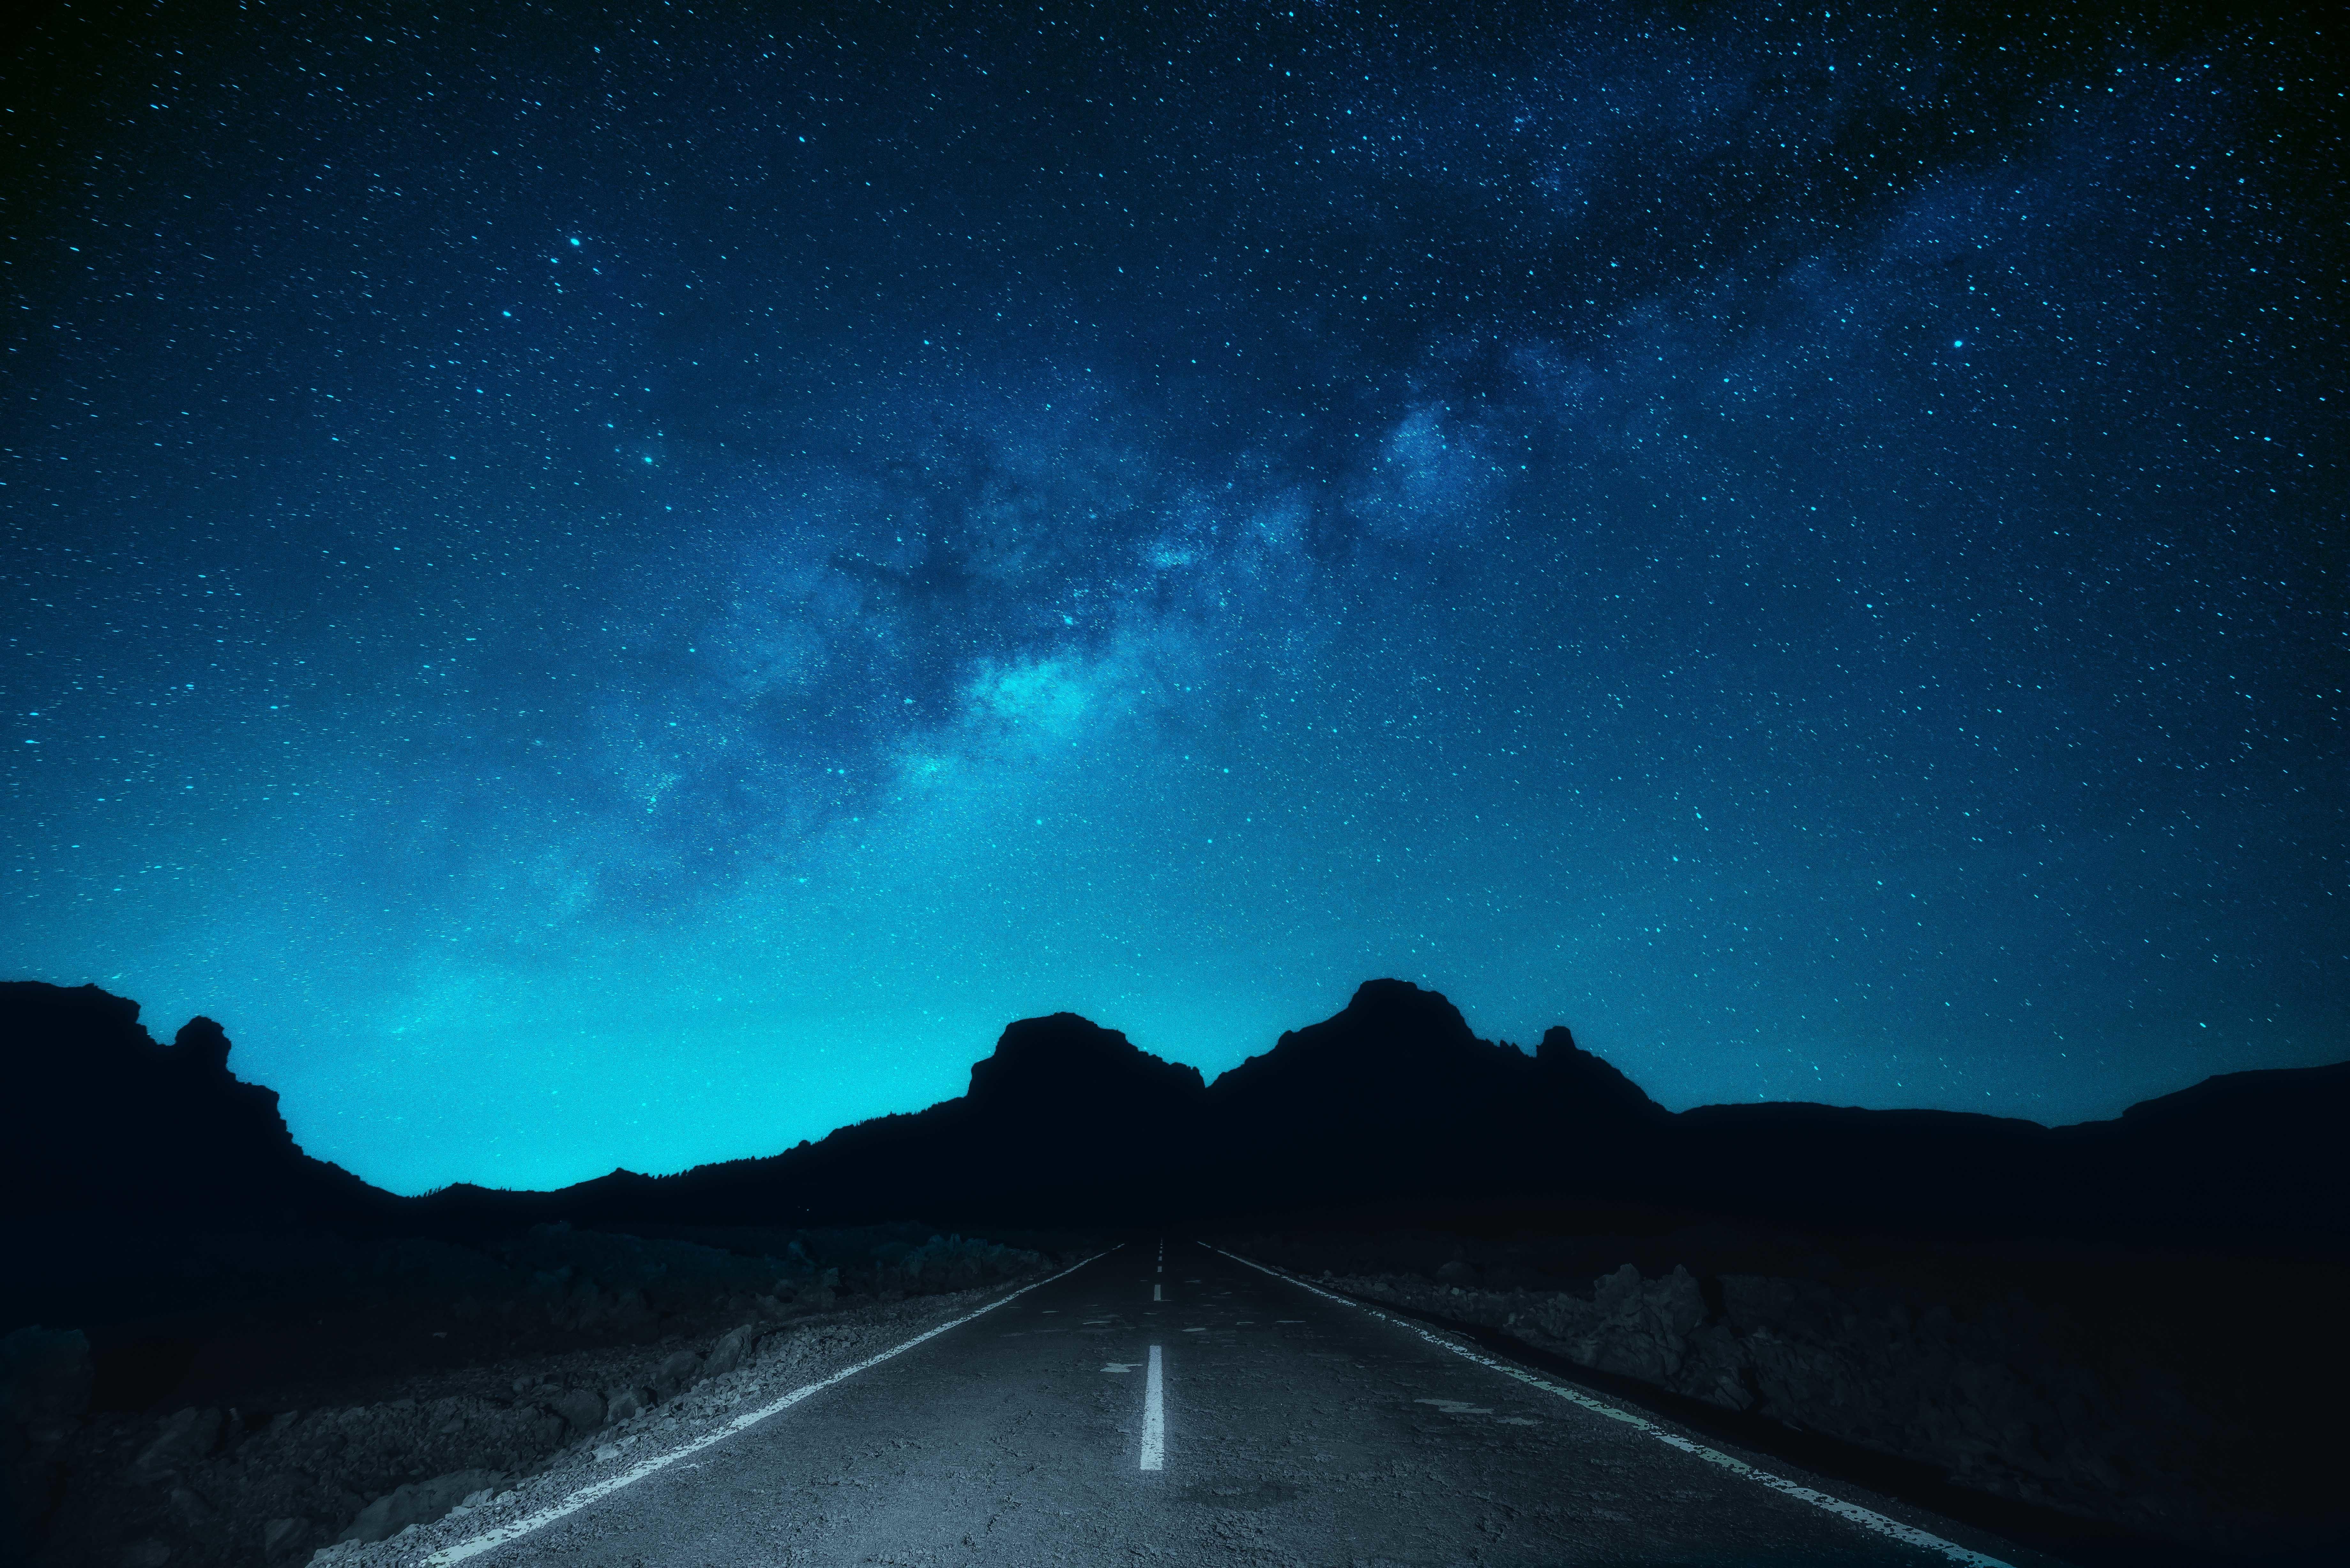 2560x1600 Scifi Milky Way 2560x1600 Resolution HD 4k